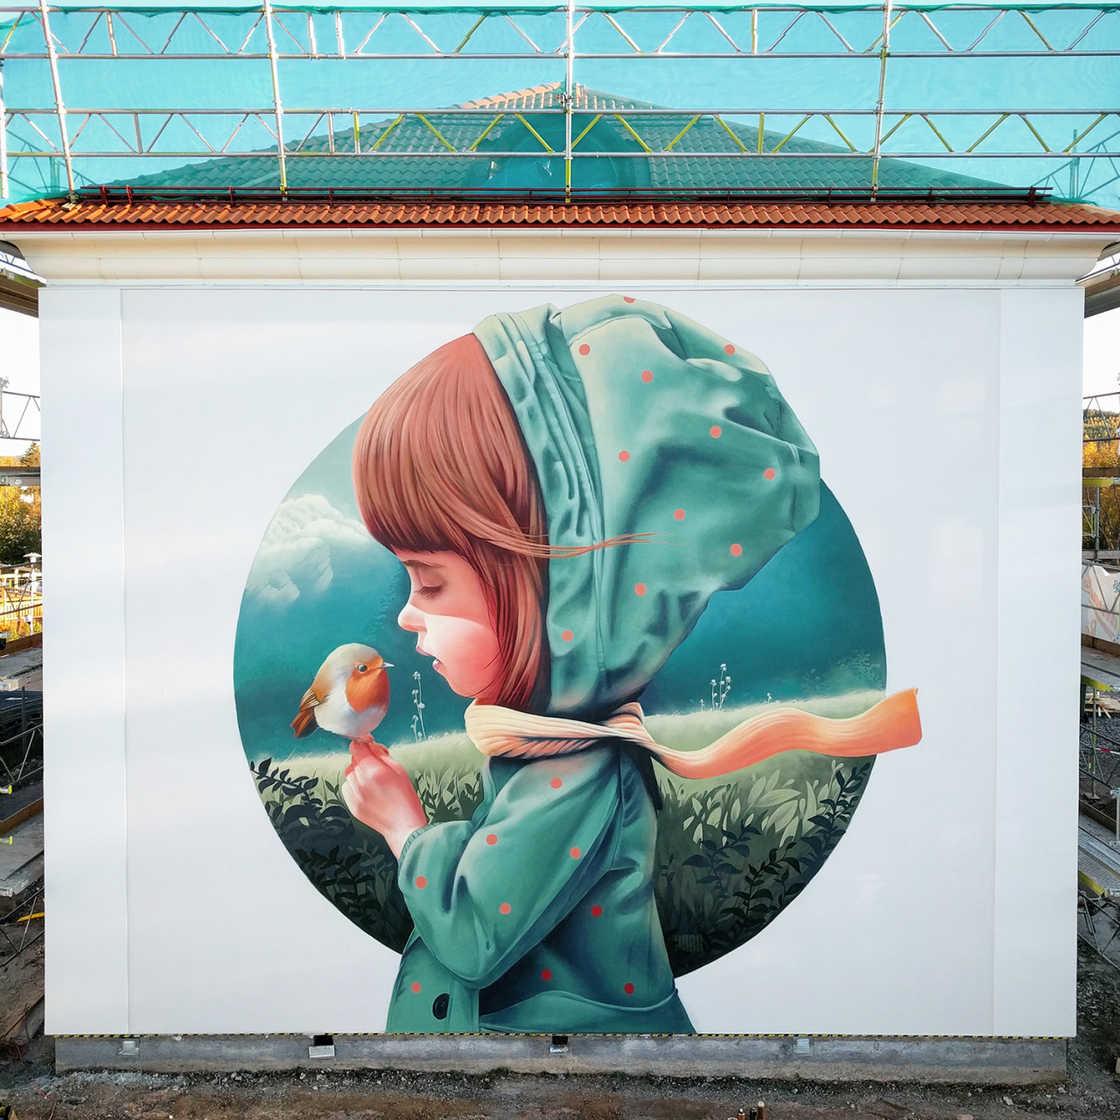 yash-one-street-art-14.jpg